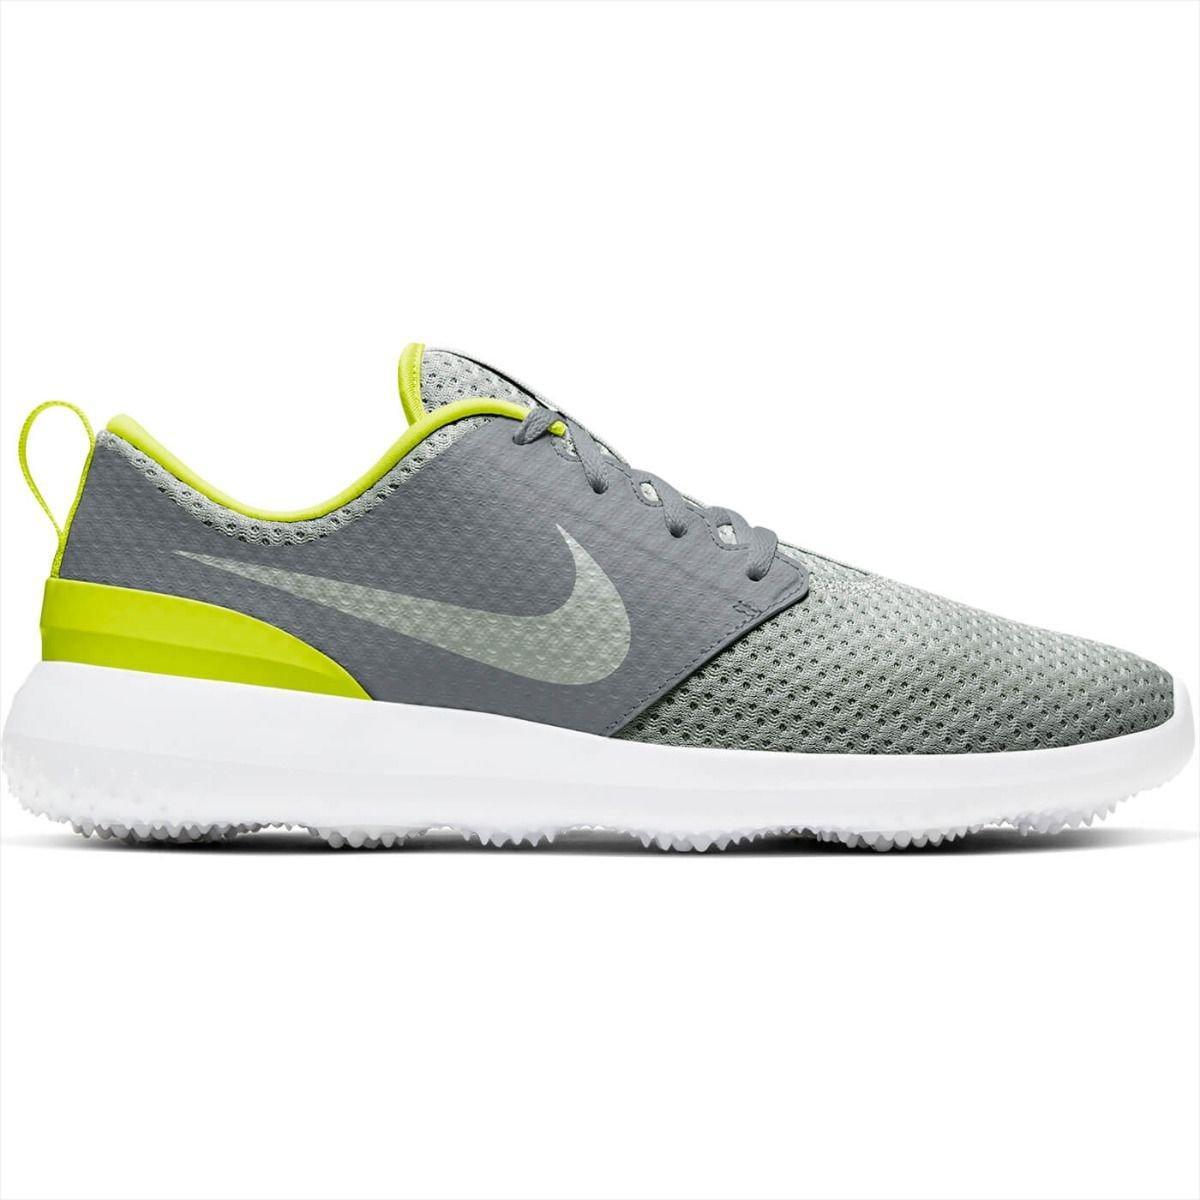 Nike Roshe G Golf Shoes 2020 Smoke Grey